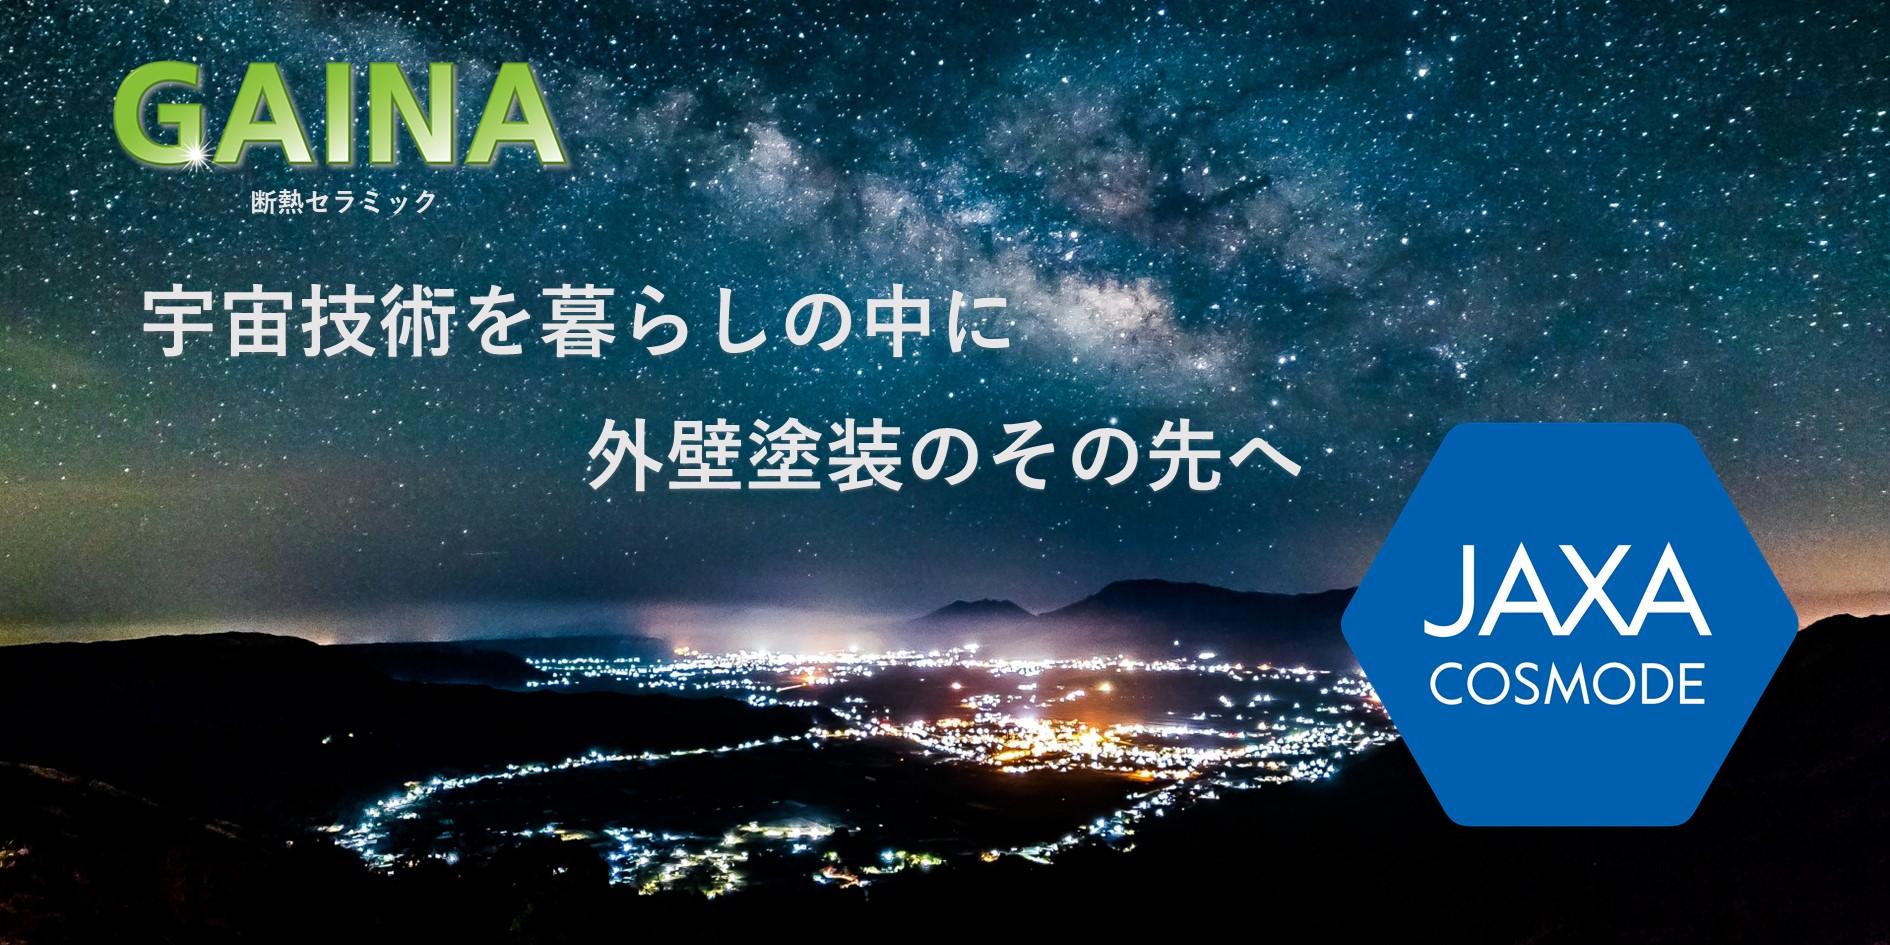 HPトップスライド用ガイナ宇宙